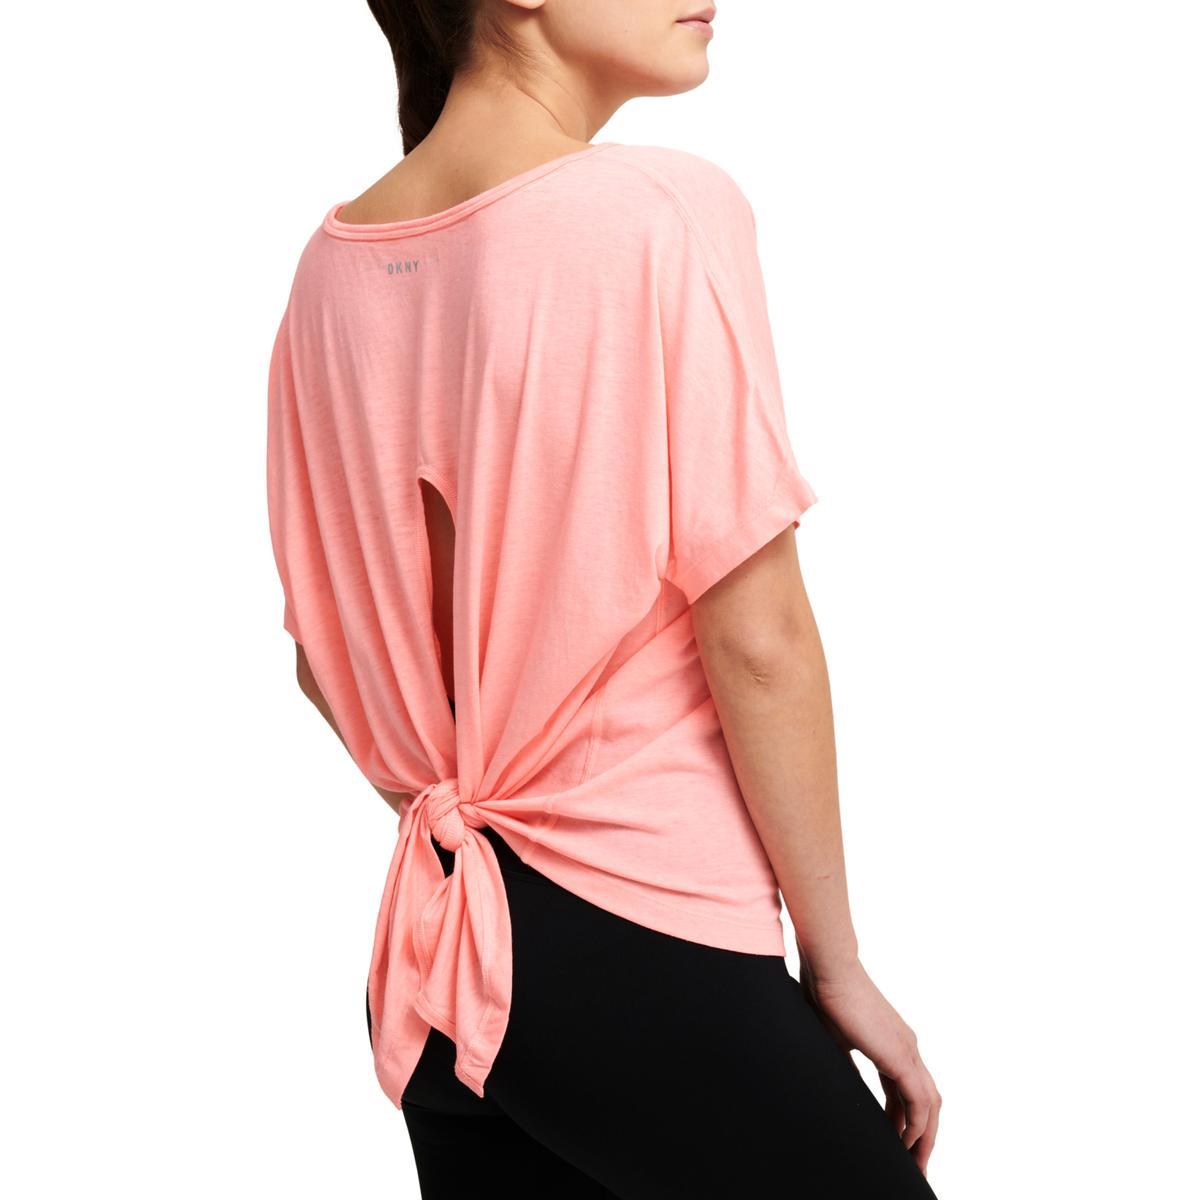 37f64e67e9 DKNY Sport Womens Pink Yoga Fitness Running T-Shirt Top M BHFO 2528 ...